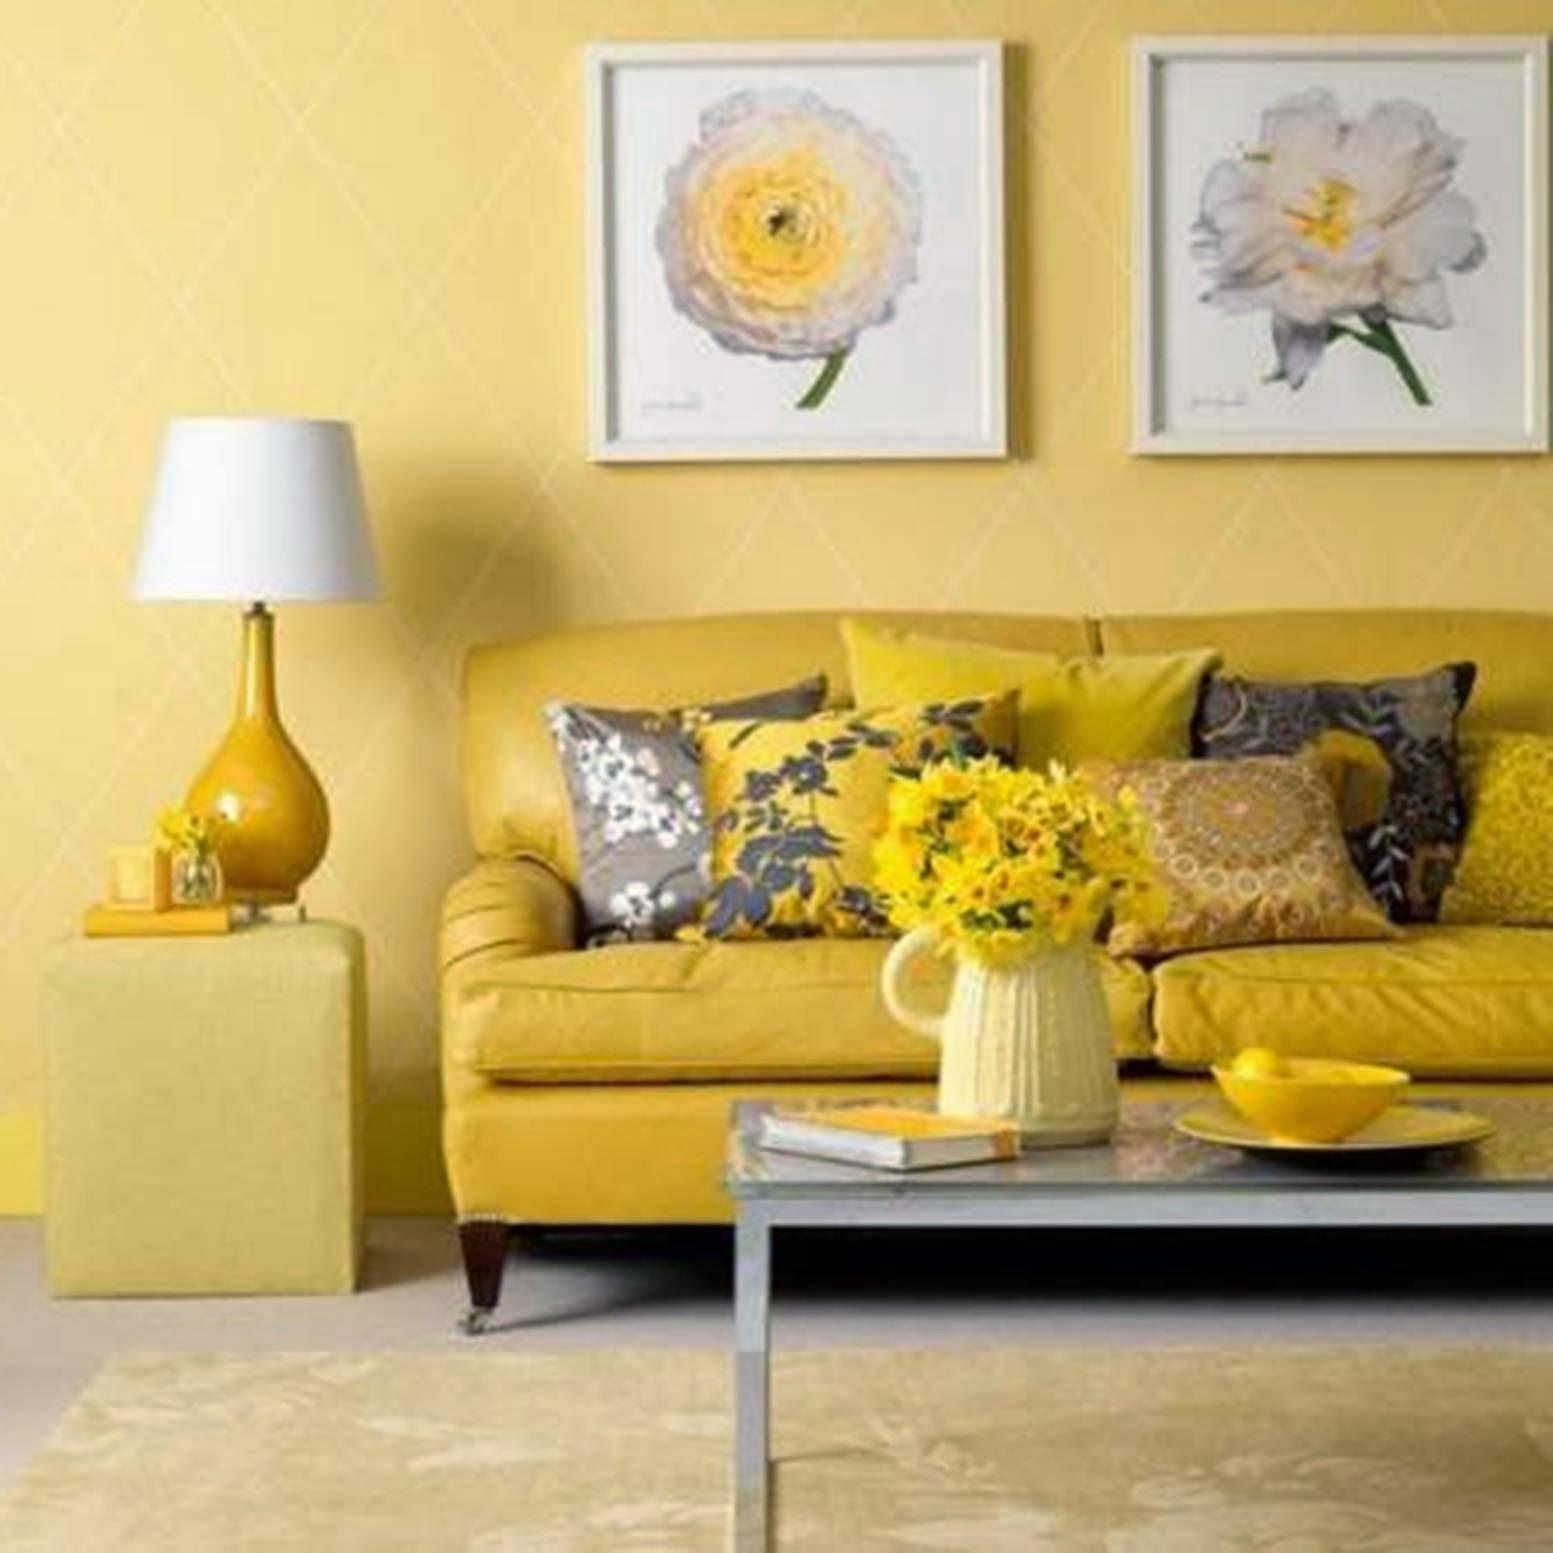 Design Decor & Disha | An Indian Design & Decor Blog: Fall-Winter ...